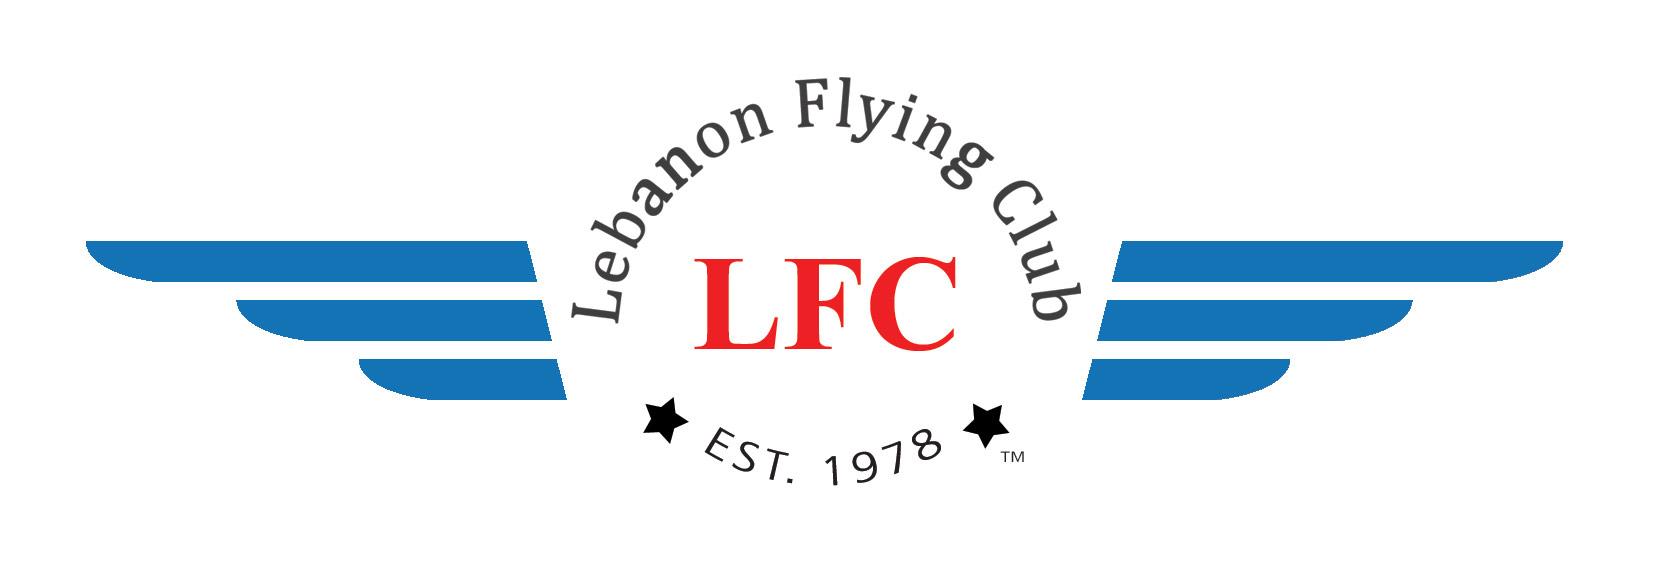 webmaster@lebanonflyingclub.org